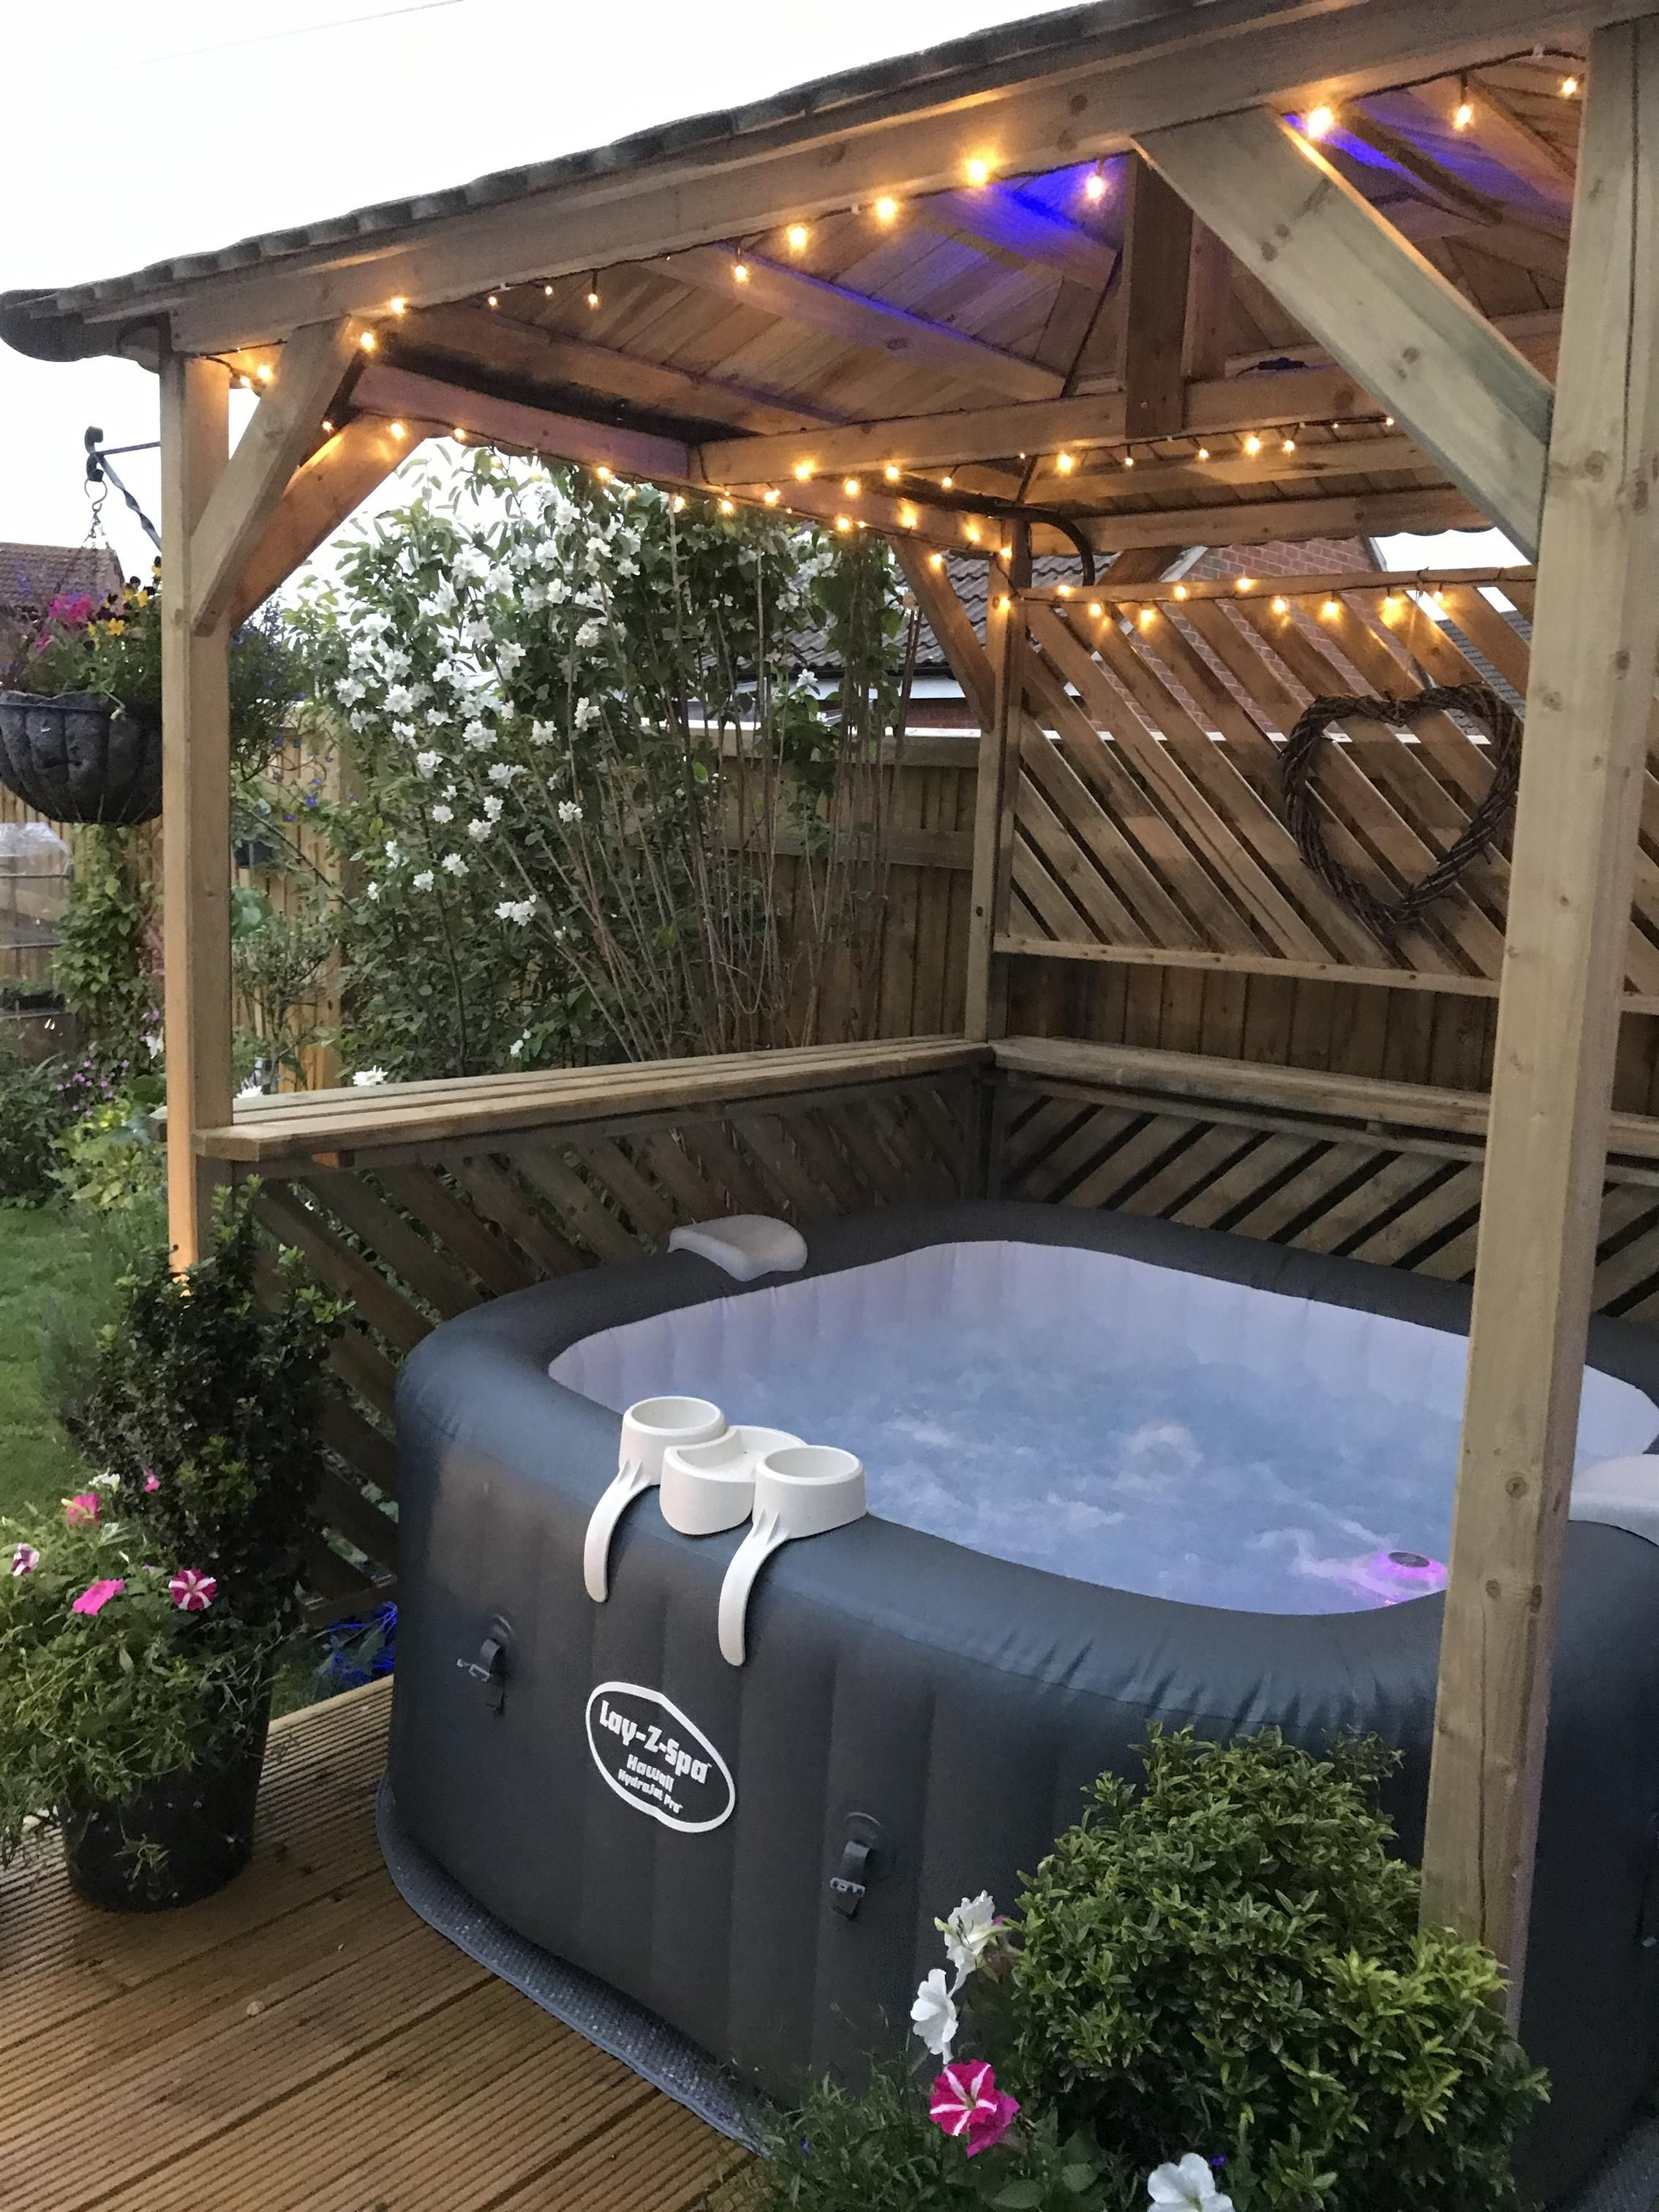 Pin by Jupin Seigne on Spa   Hot tub patio, Hot tub gazebo ...